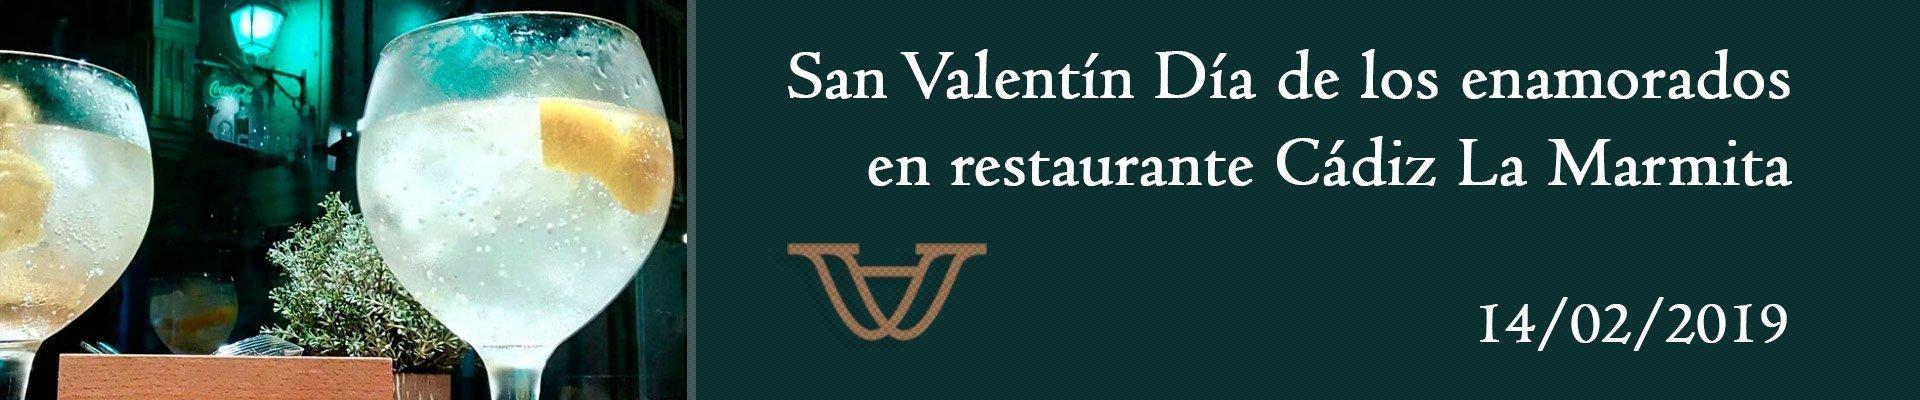 San Valentin 14 febrero